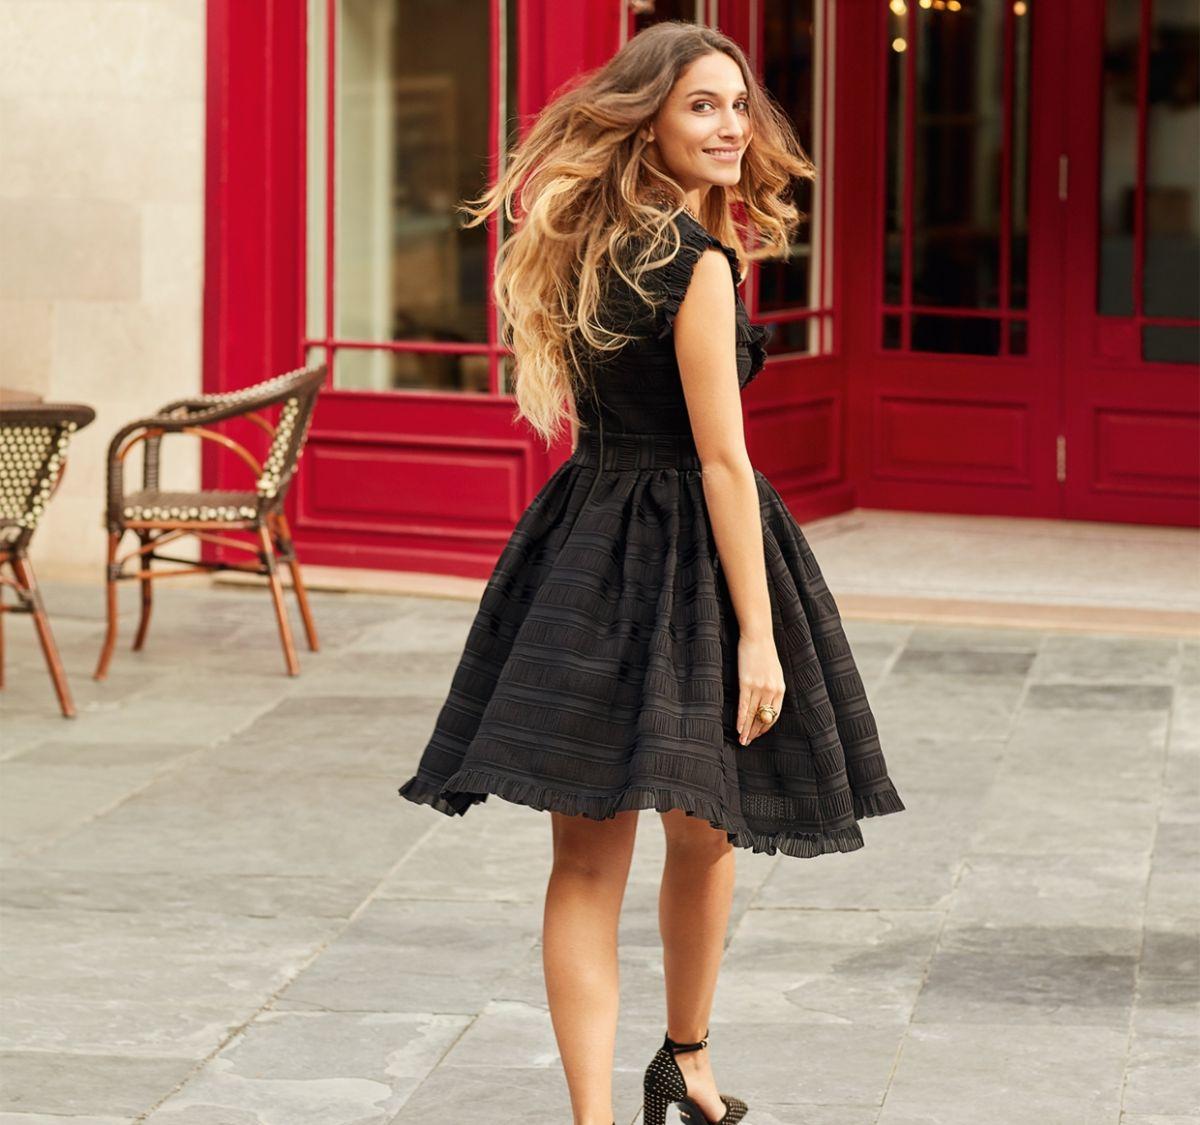 b039d06adb03 9 tips για τα ρούχα σου ώστε να δείχνεις ΠΑΝΤΑ σαν να βγήκες από περιοδικό  μόδας!